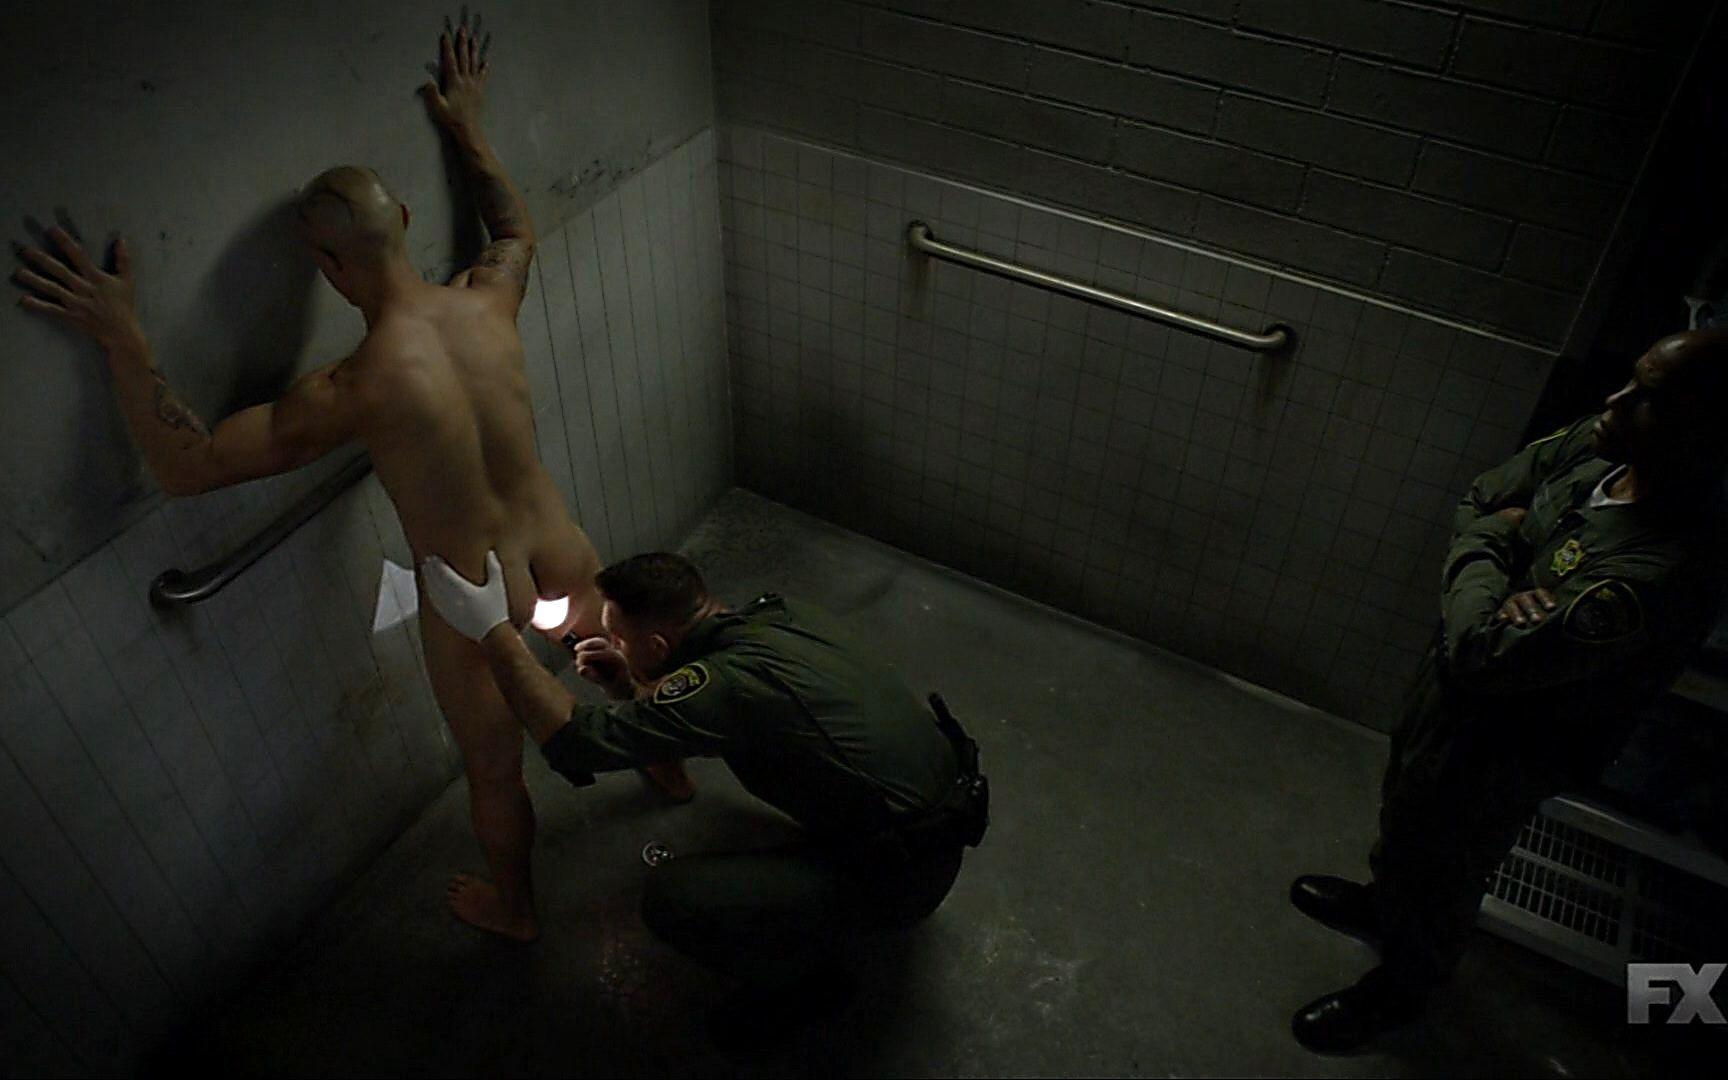 gay doctor sensual massage morley